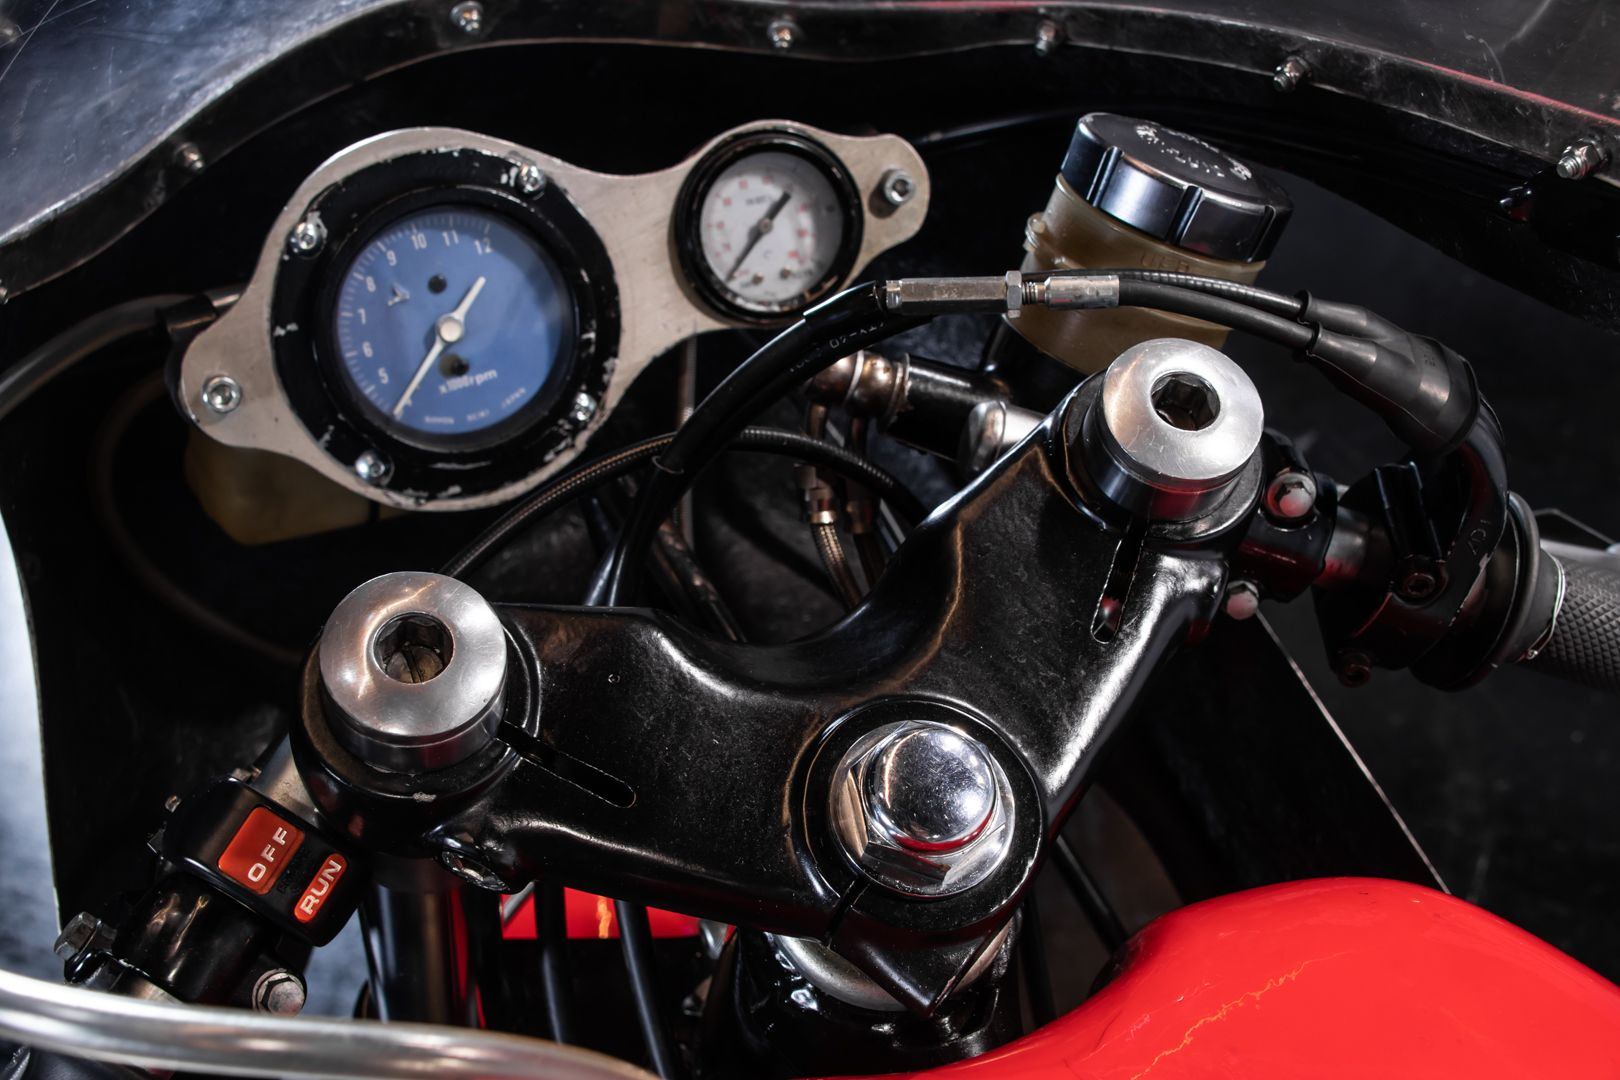 1973 Honda 750 Daytona Replica 72329